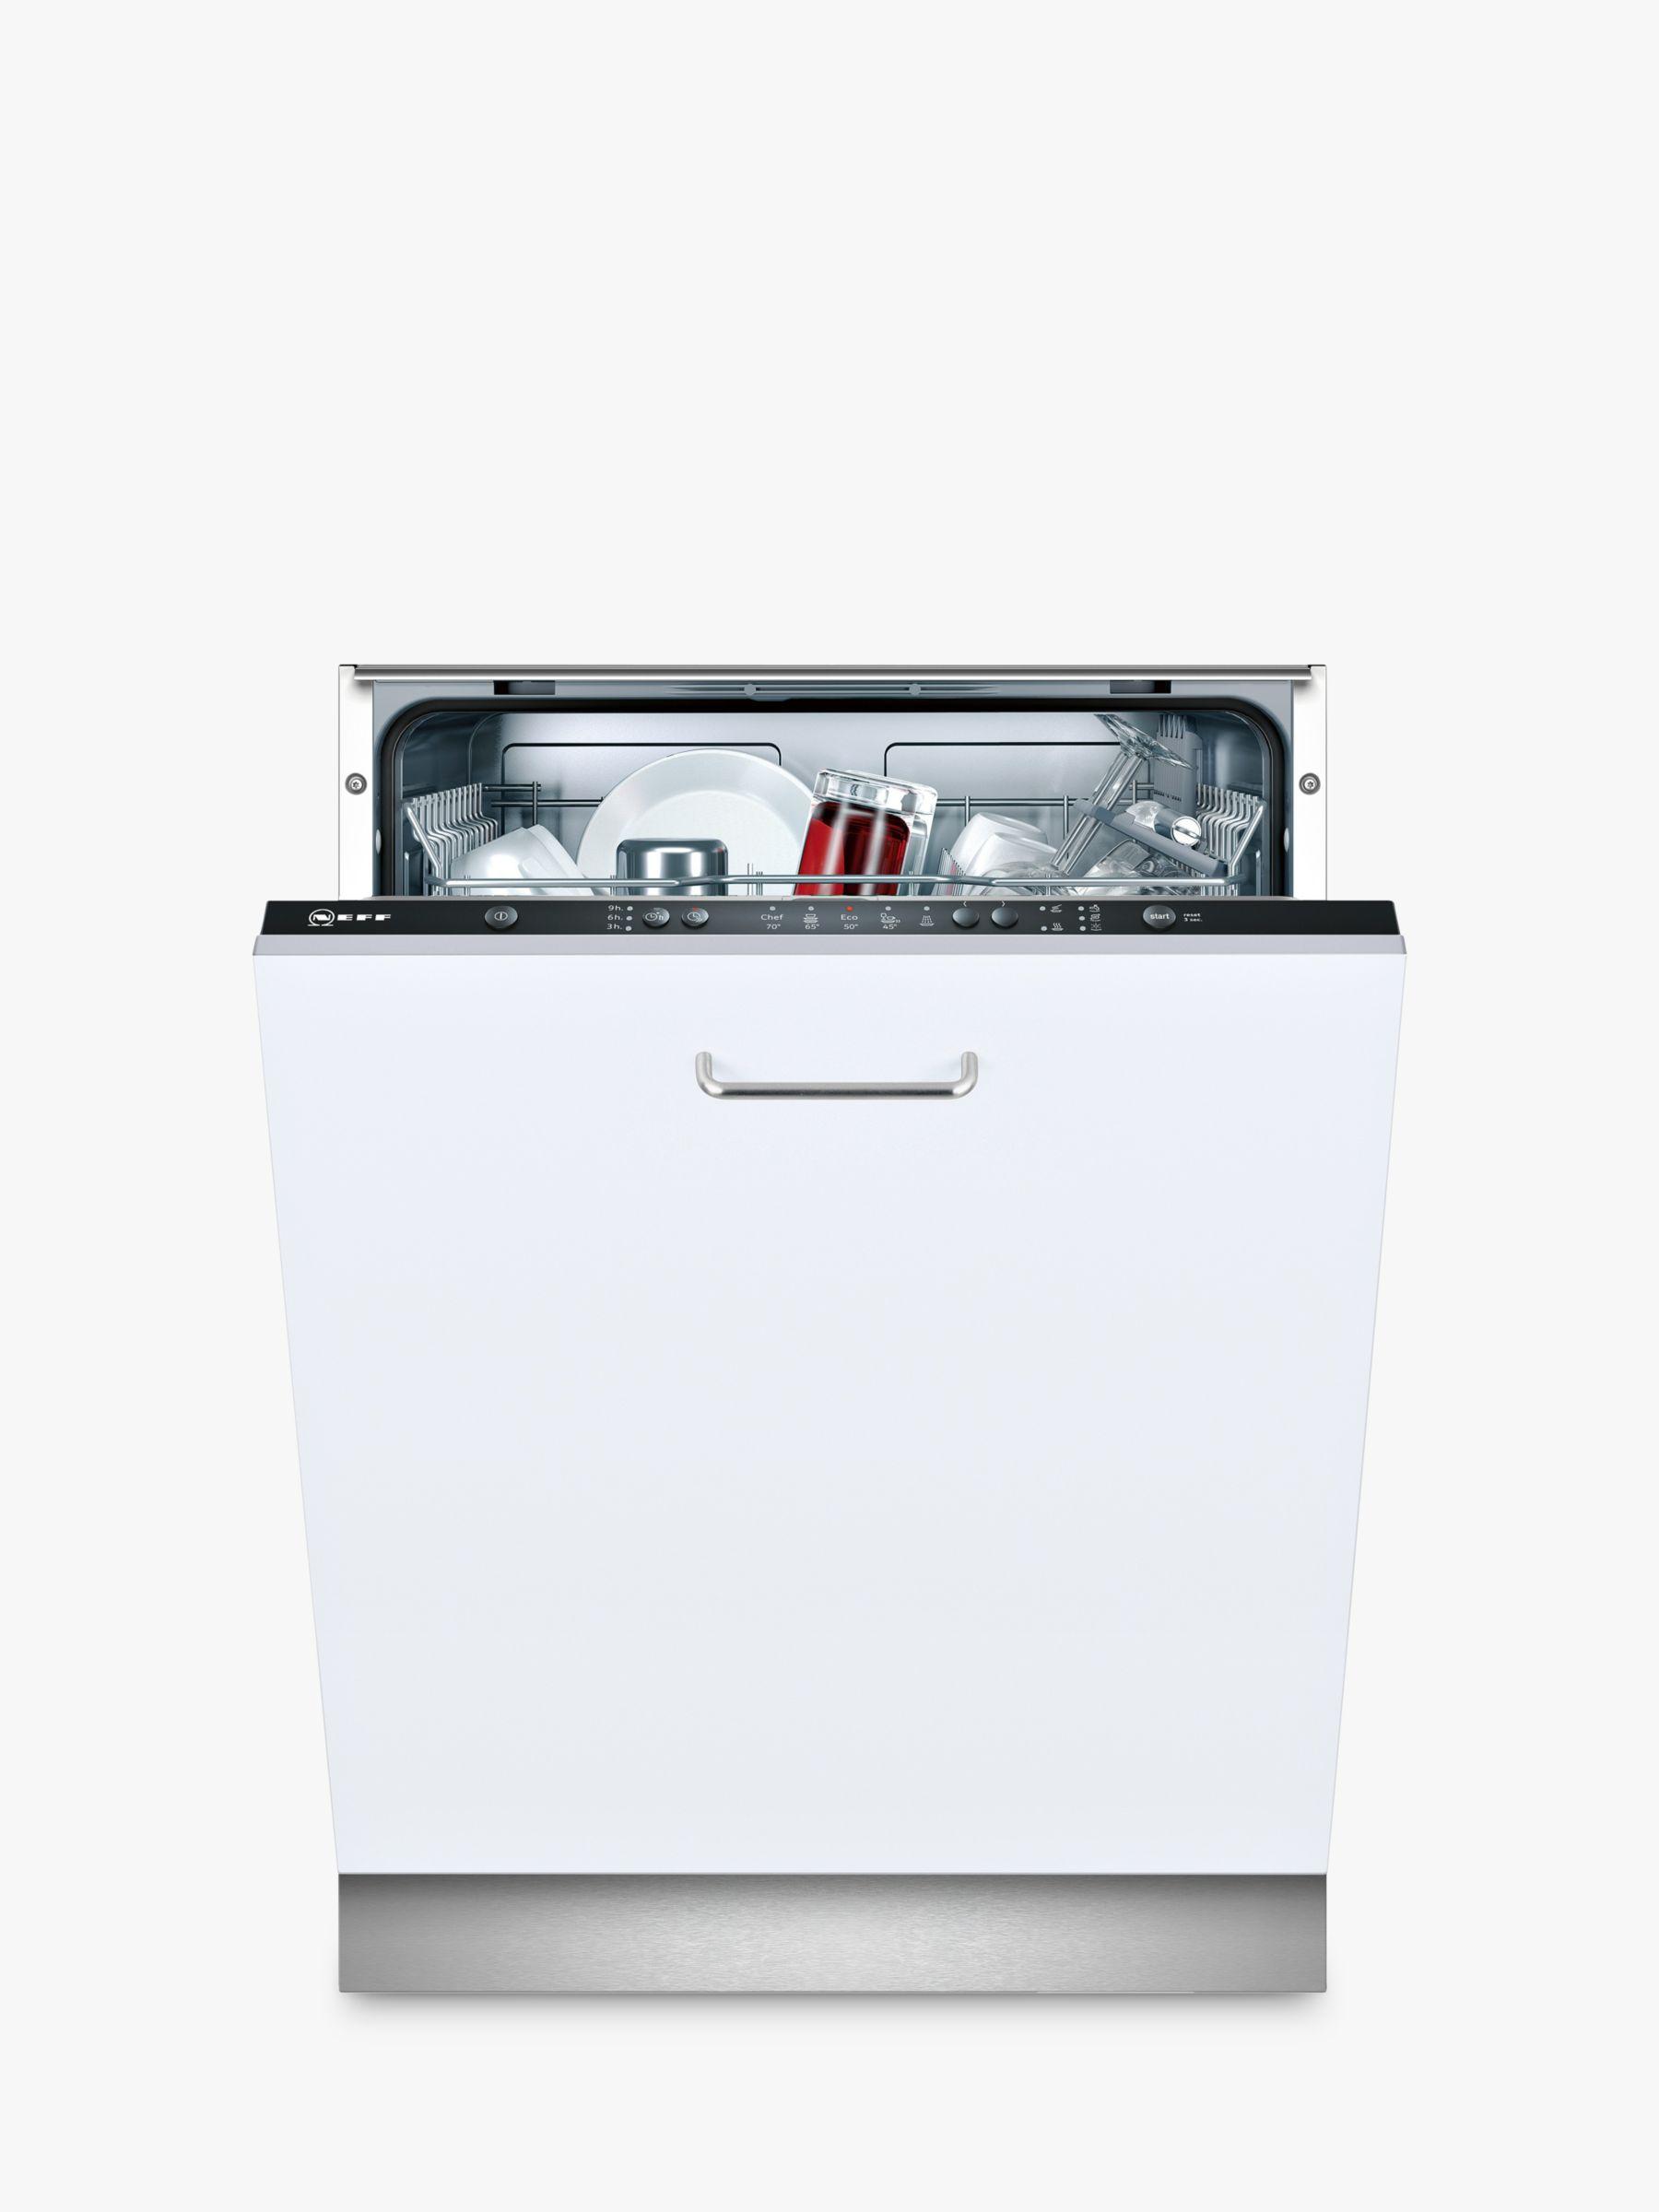 NEFF Neff S511A50X1G Integrated Dishwasher, White